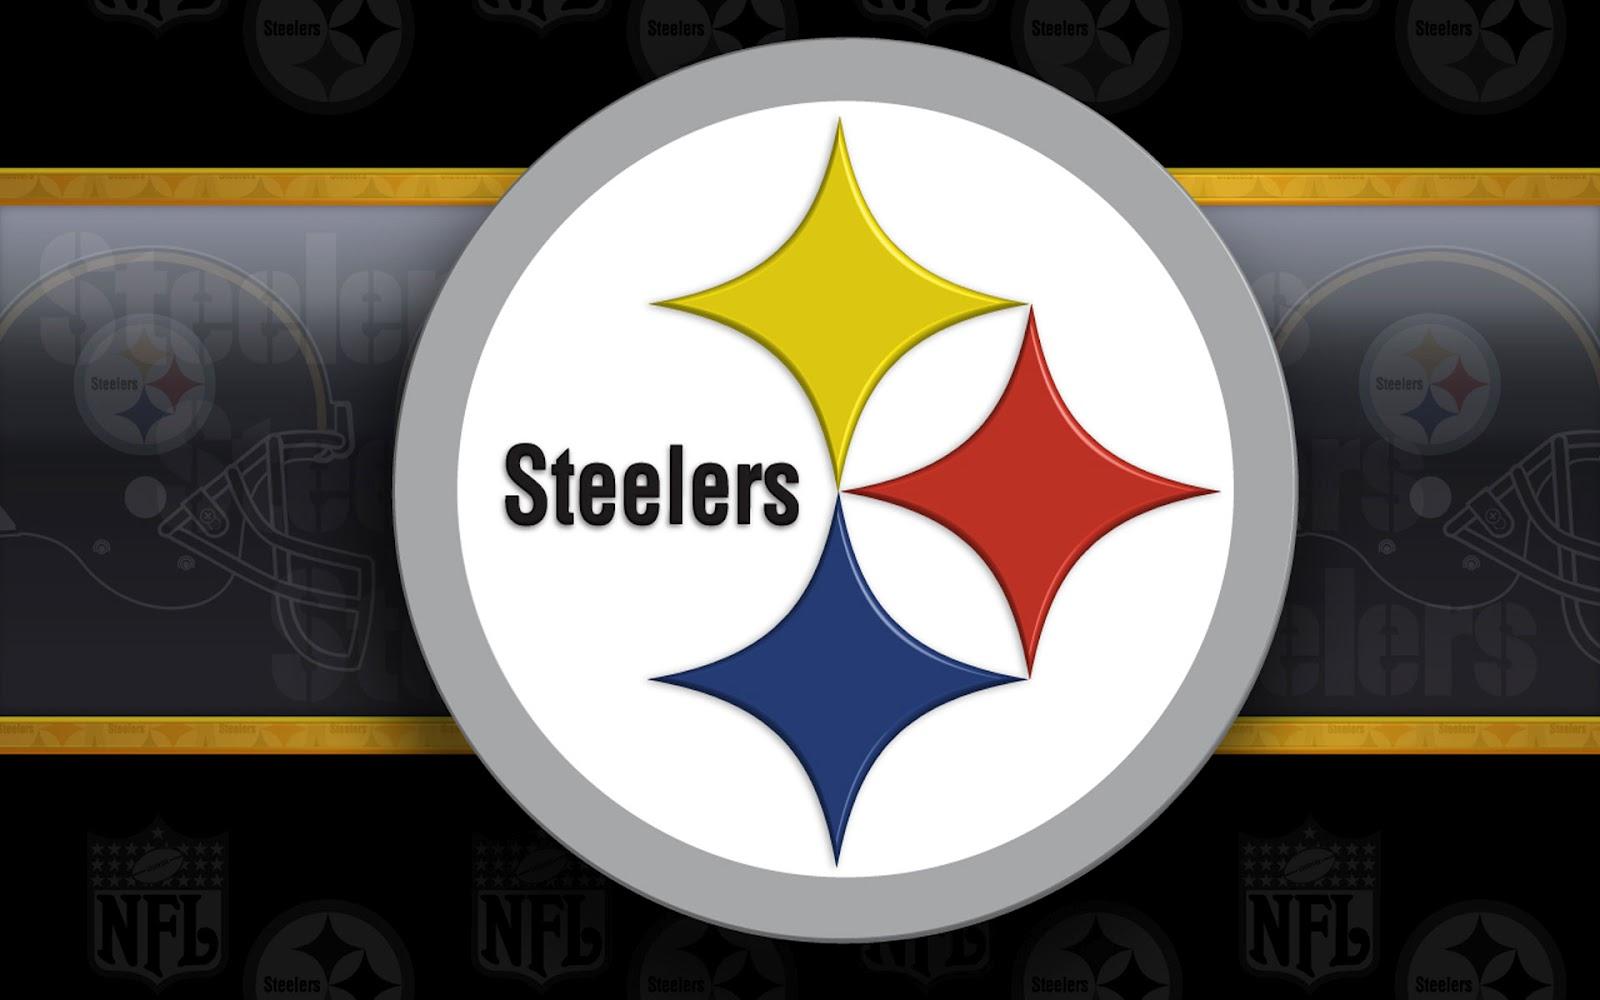 Steelers Logo Wallpaper | Top HD Wallpapers